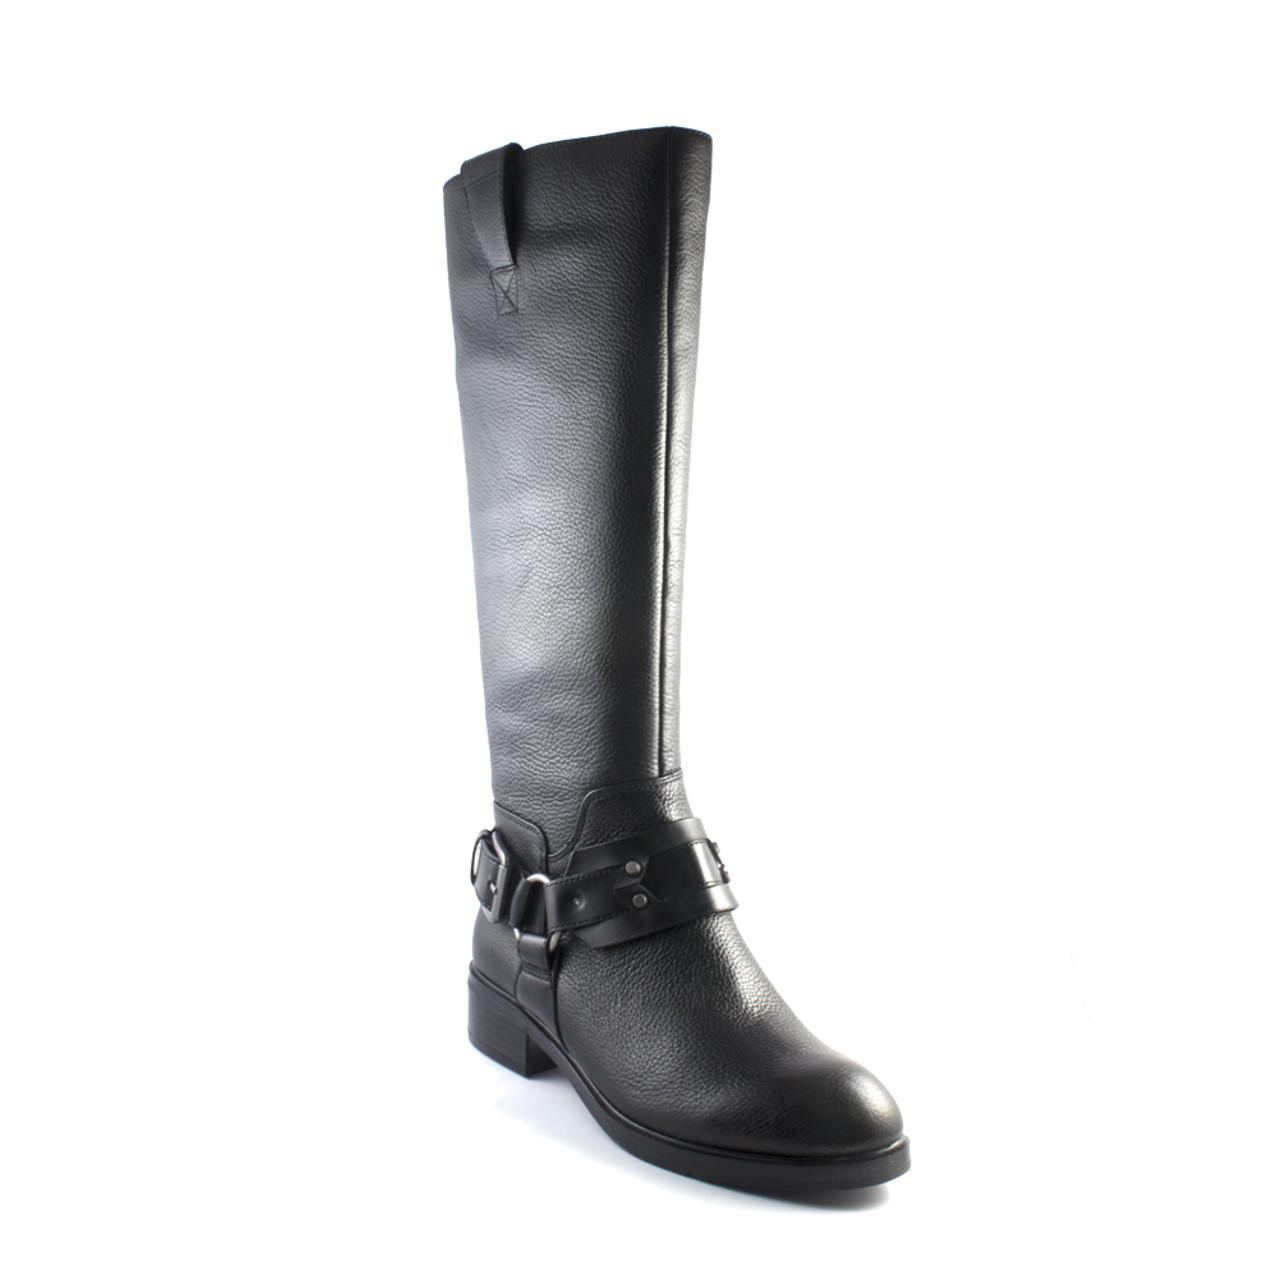 67fcc2f3e5c Nine West Women's Jamison Knee-High Boot Black Leather